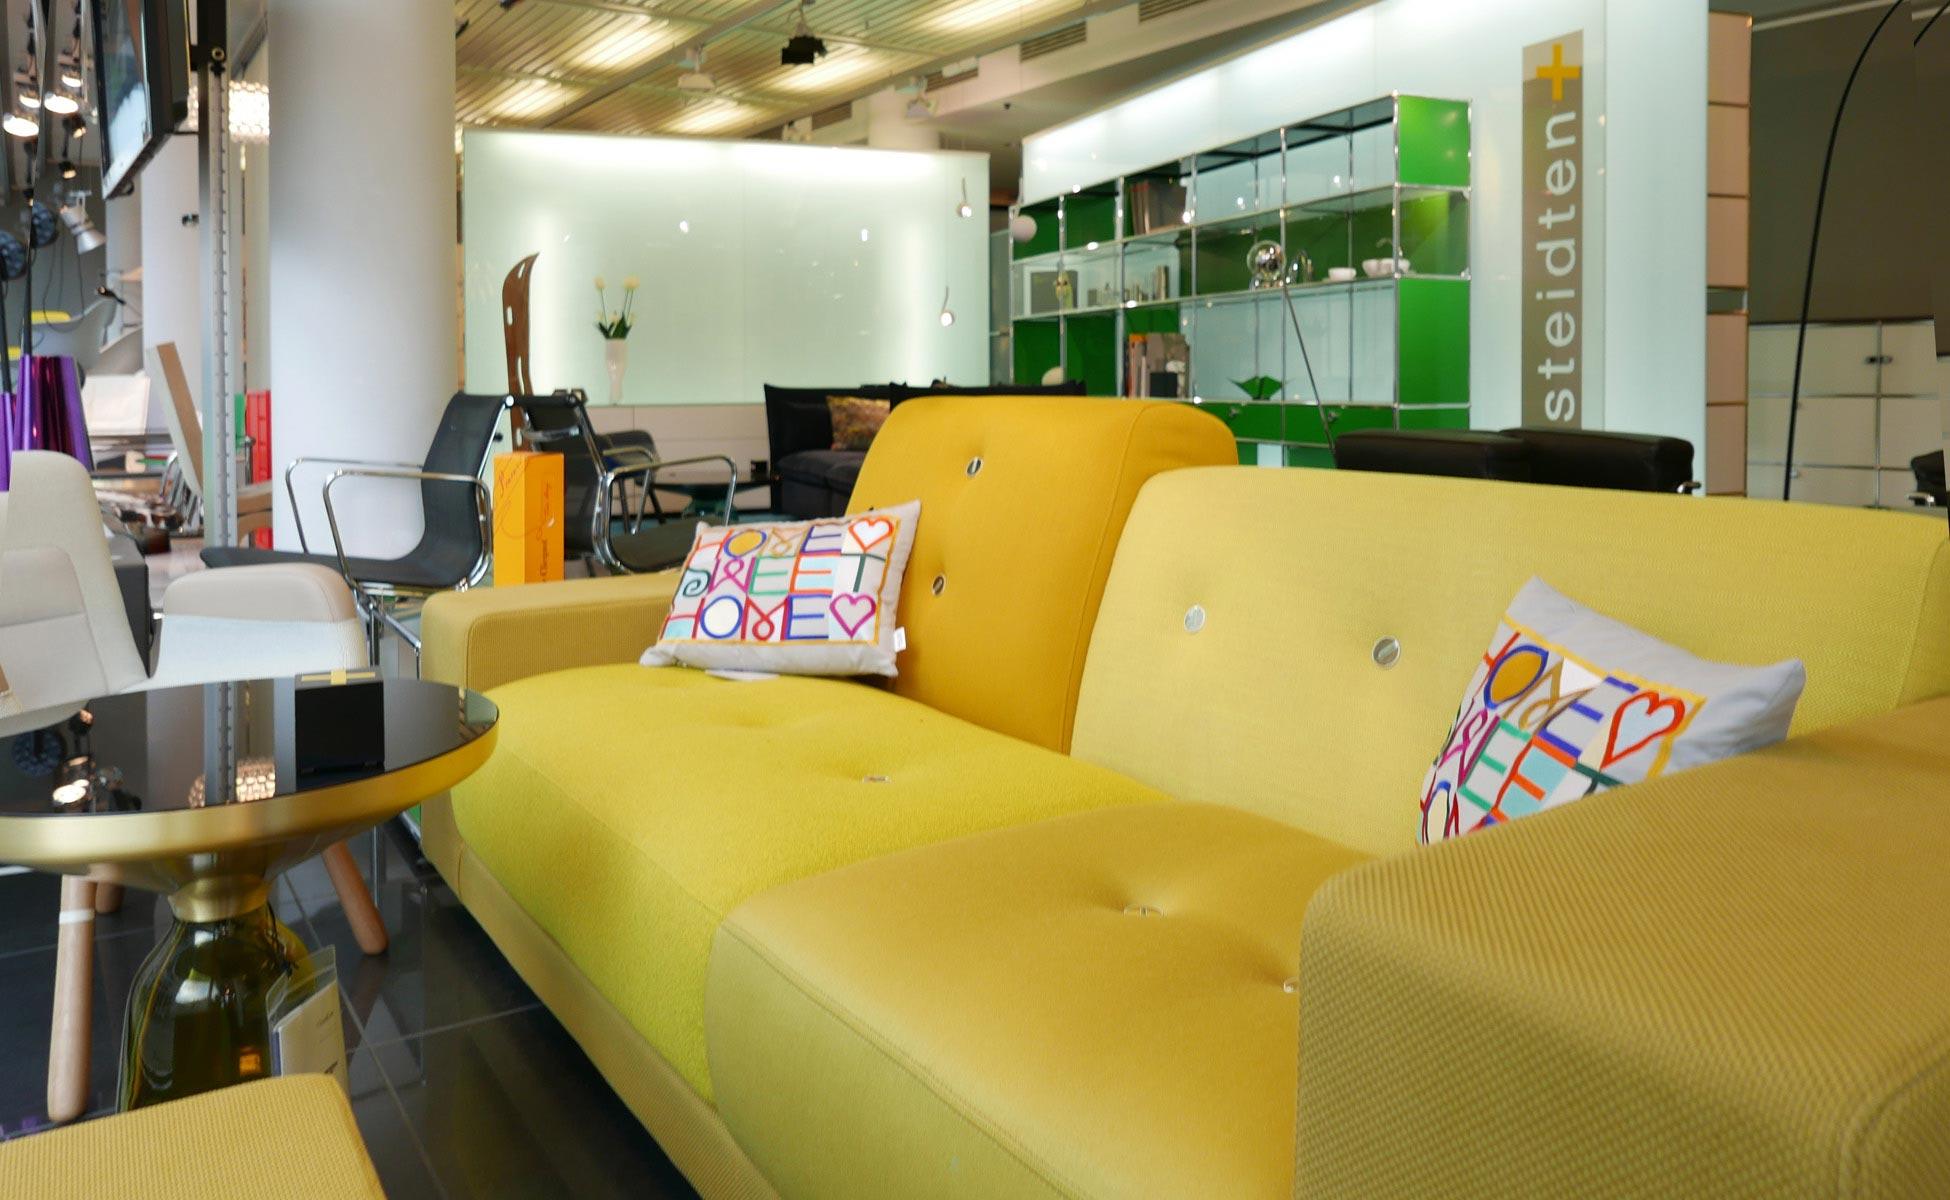 vitra polder sofa im steidten+ showroom in berlin